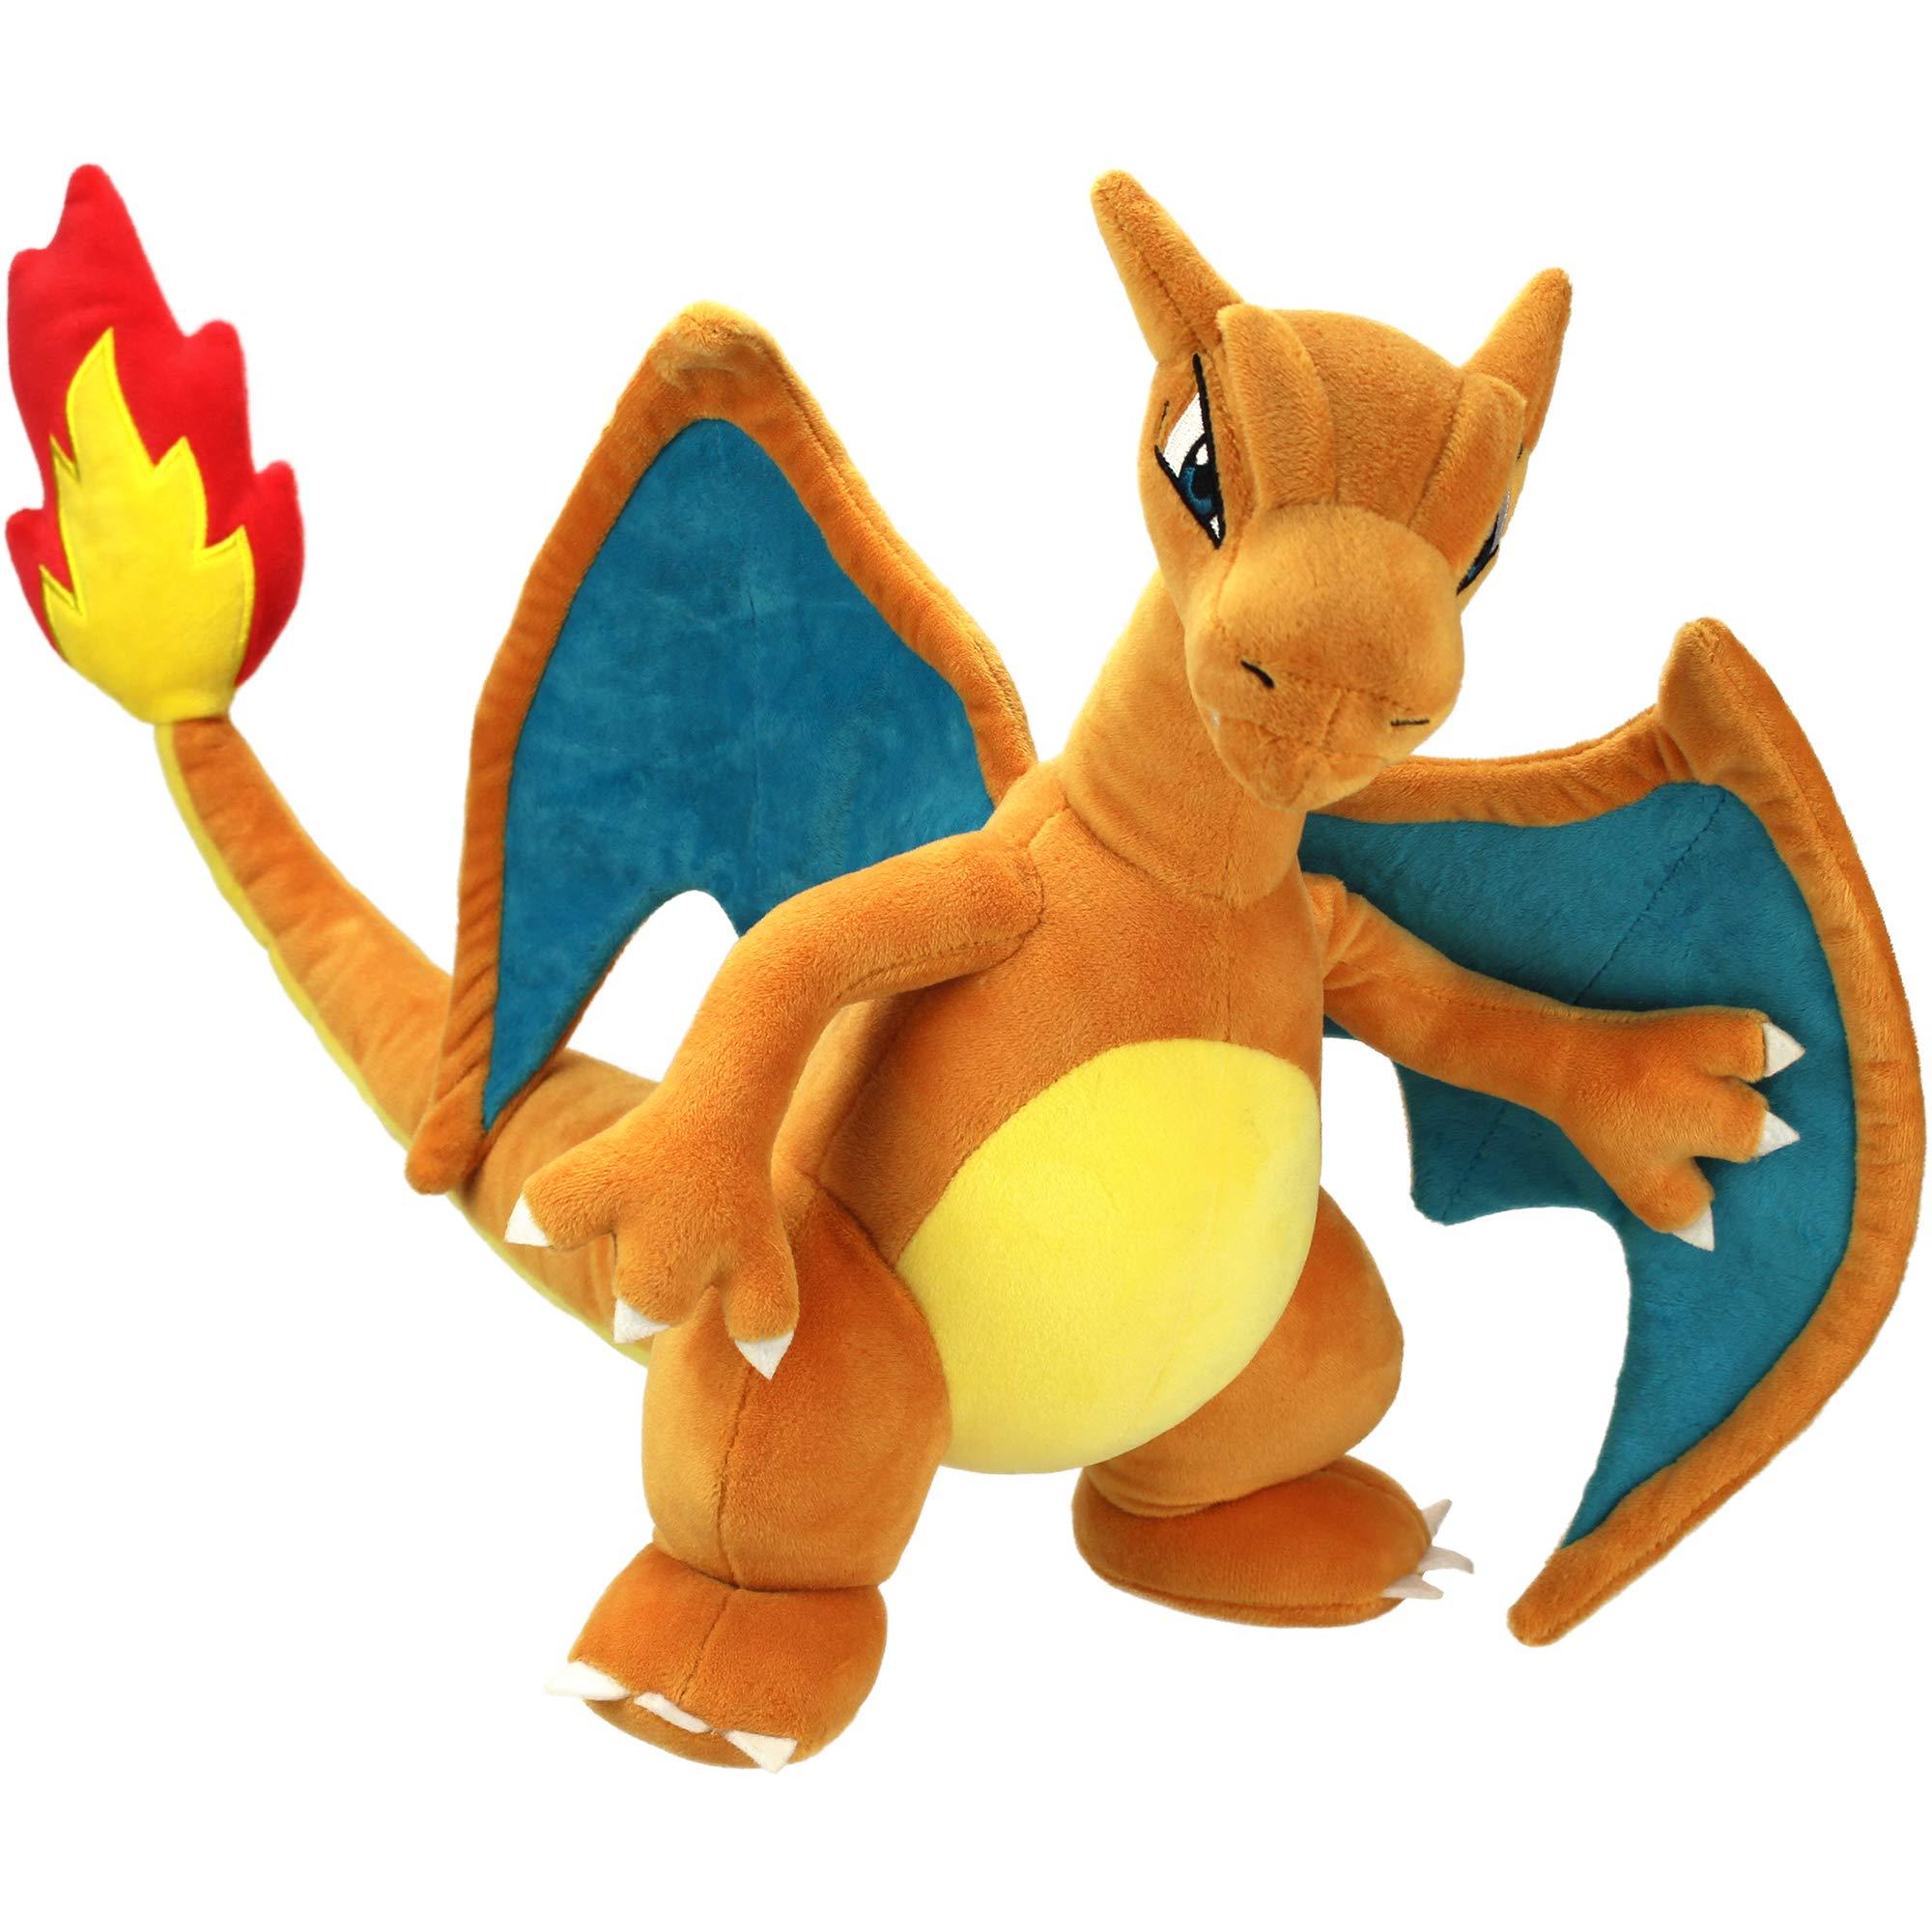 Pokémon Charizard Plush Stuffed Animal Toy - Large 12'' - Ages 2+ by Pokemon